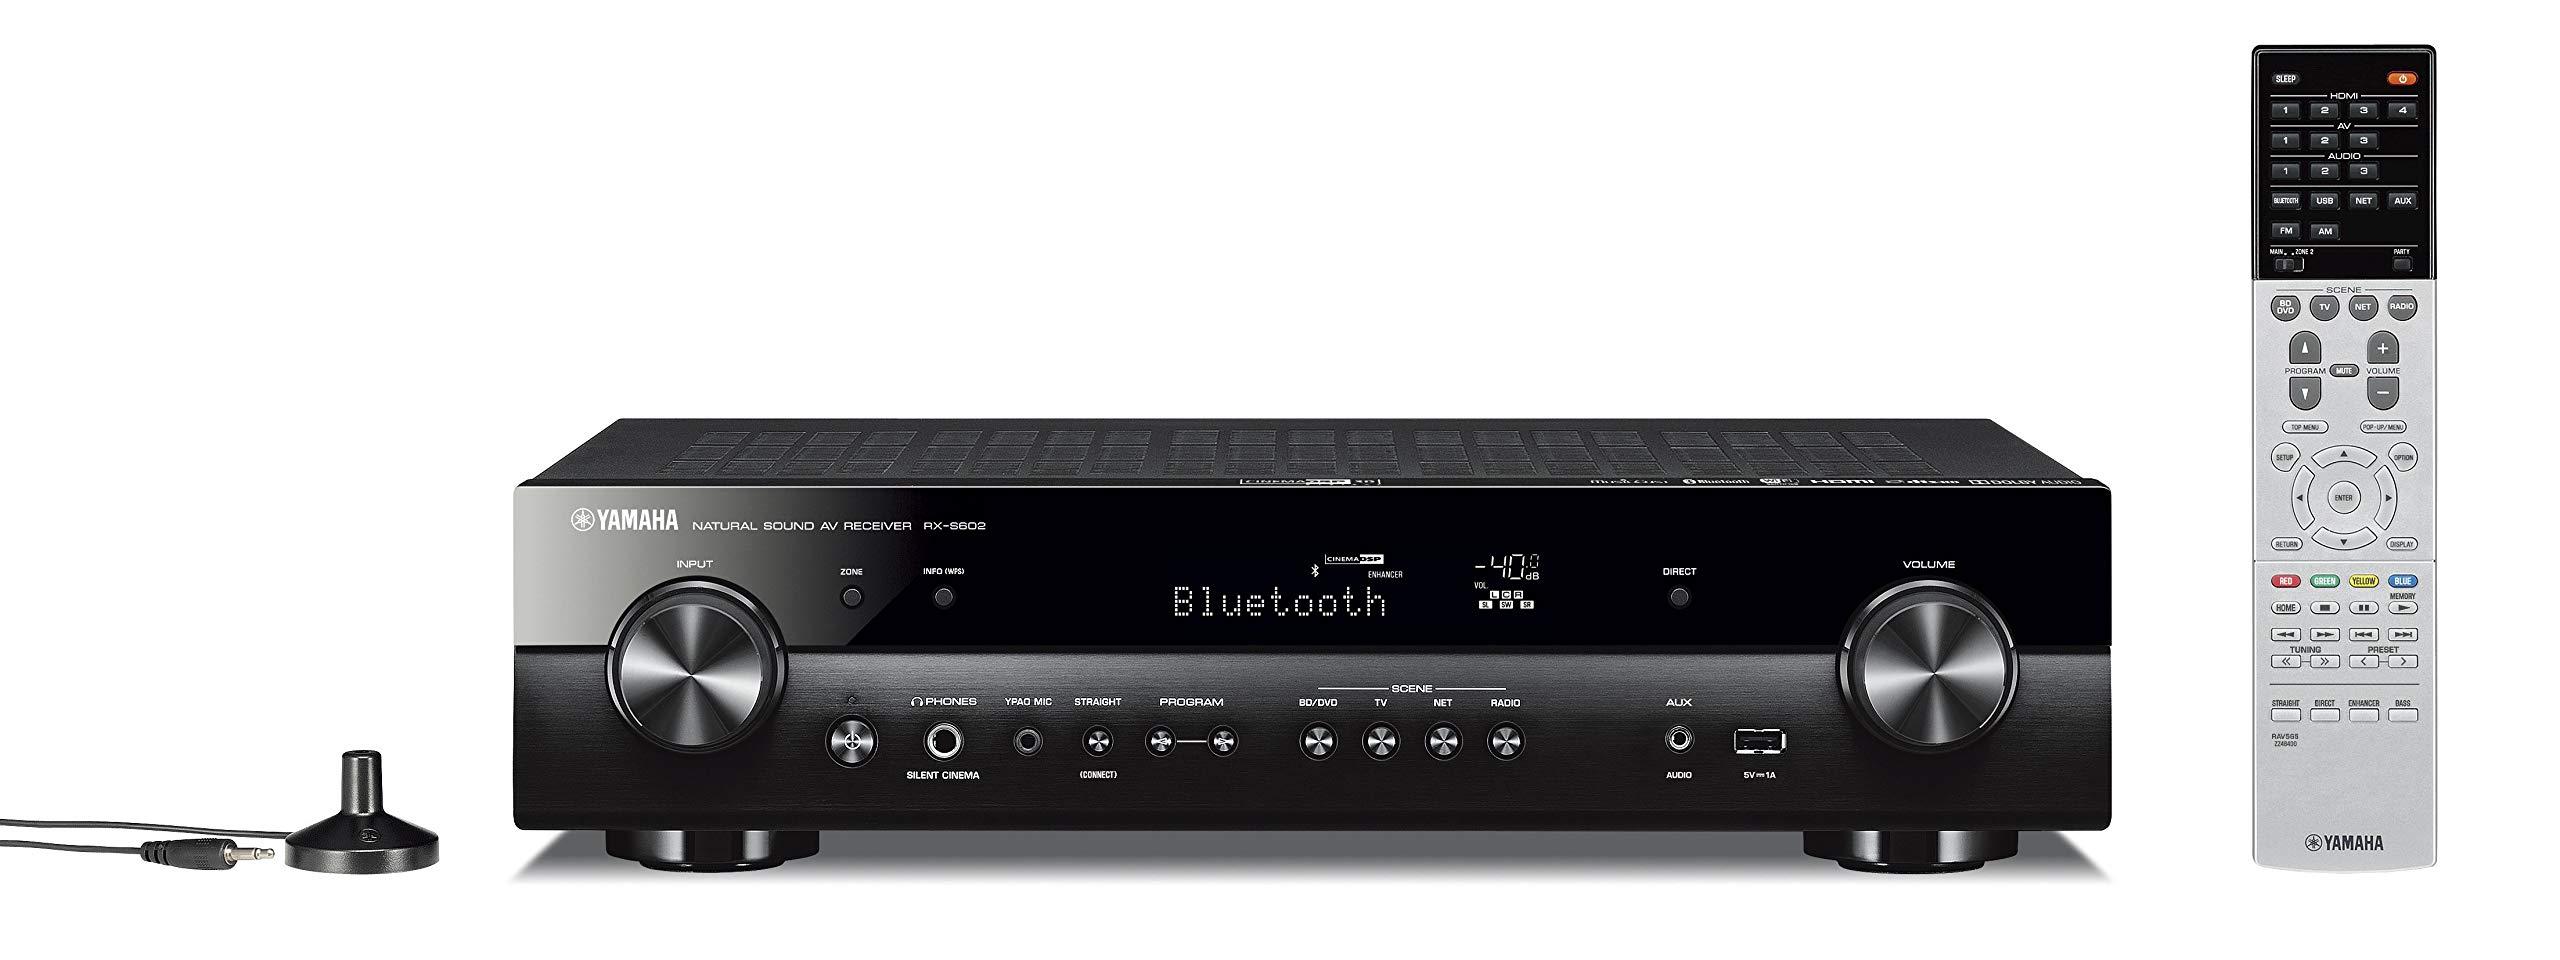 Yamaha RX-S602 Slim Audio & Video Component Receiver Slimline by Yamaha Audio (Image #5)